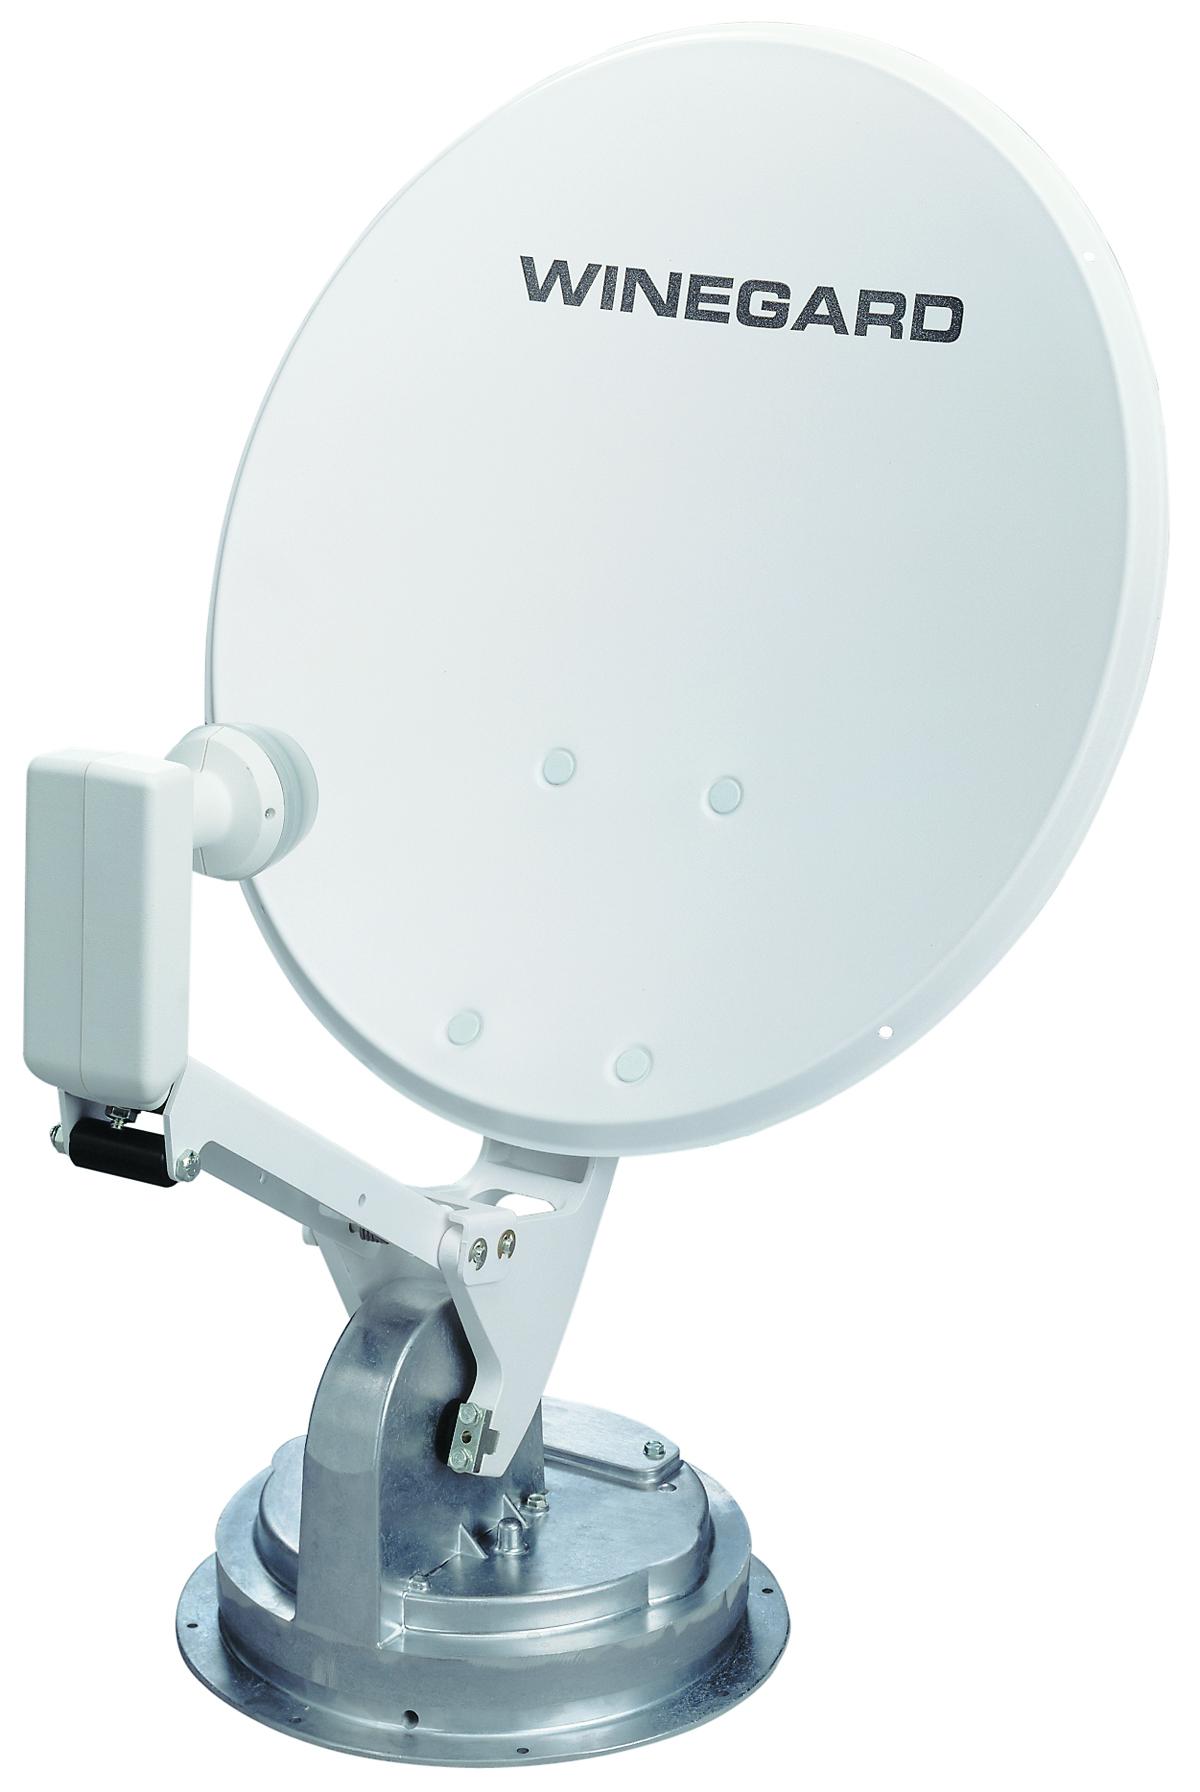 Winegard photoslogossatellite antennas hi res publicscrutiny Images